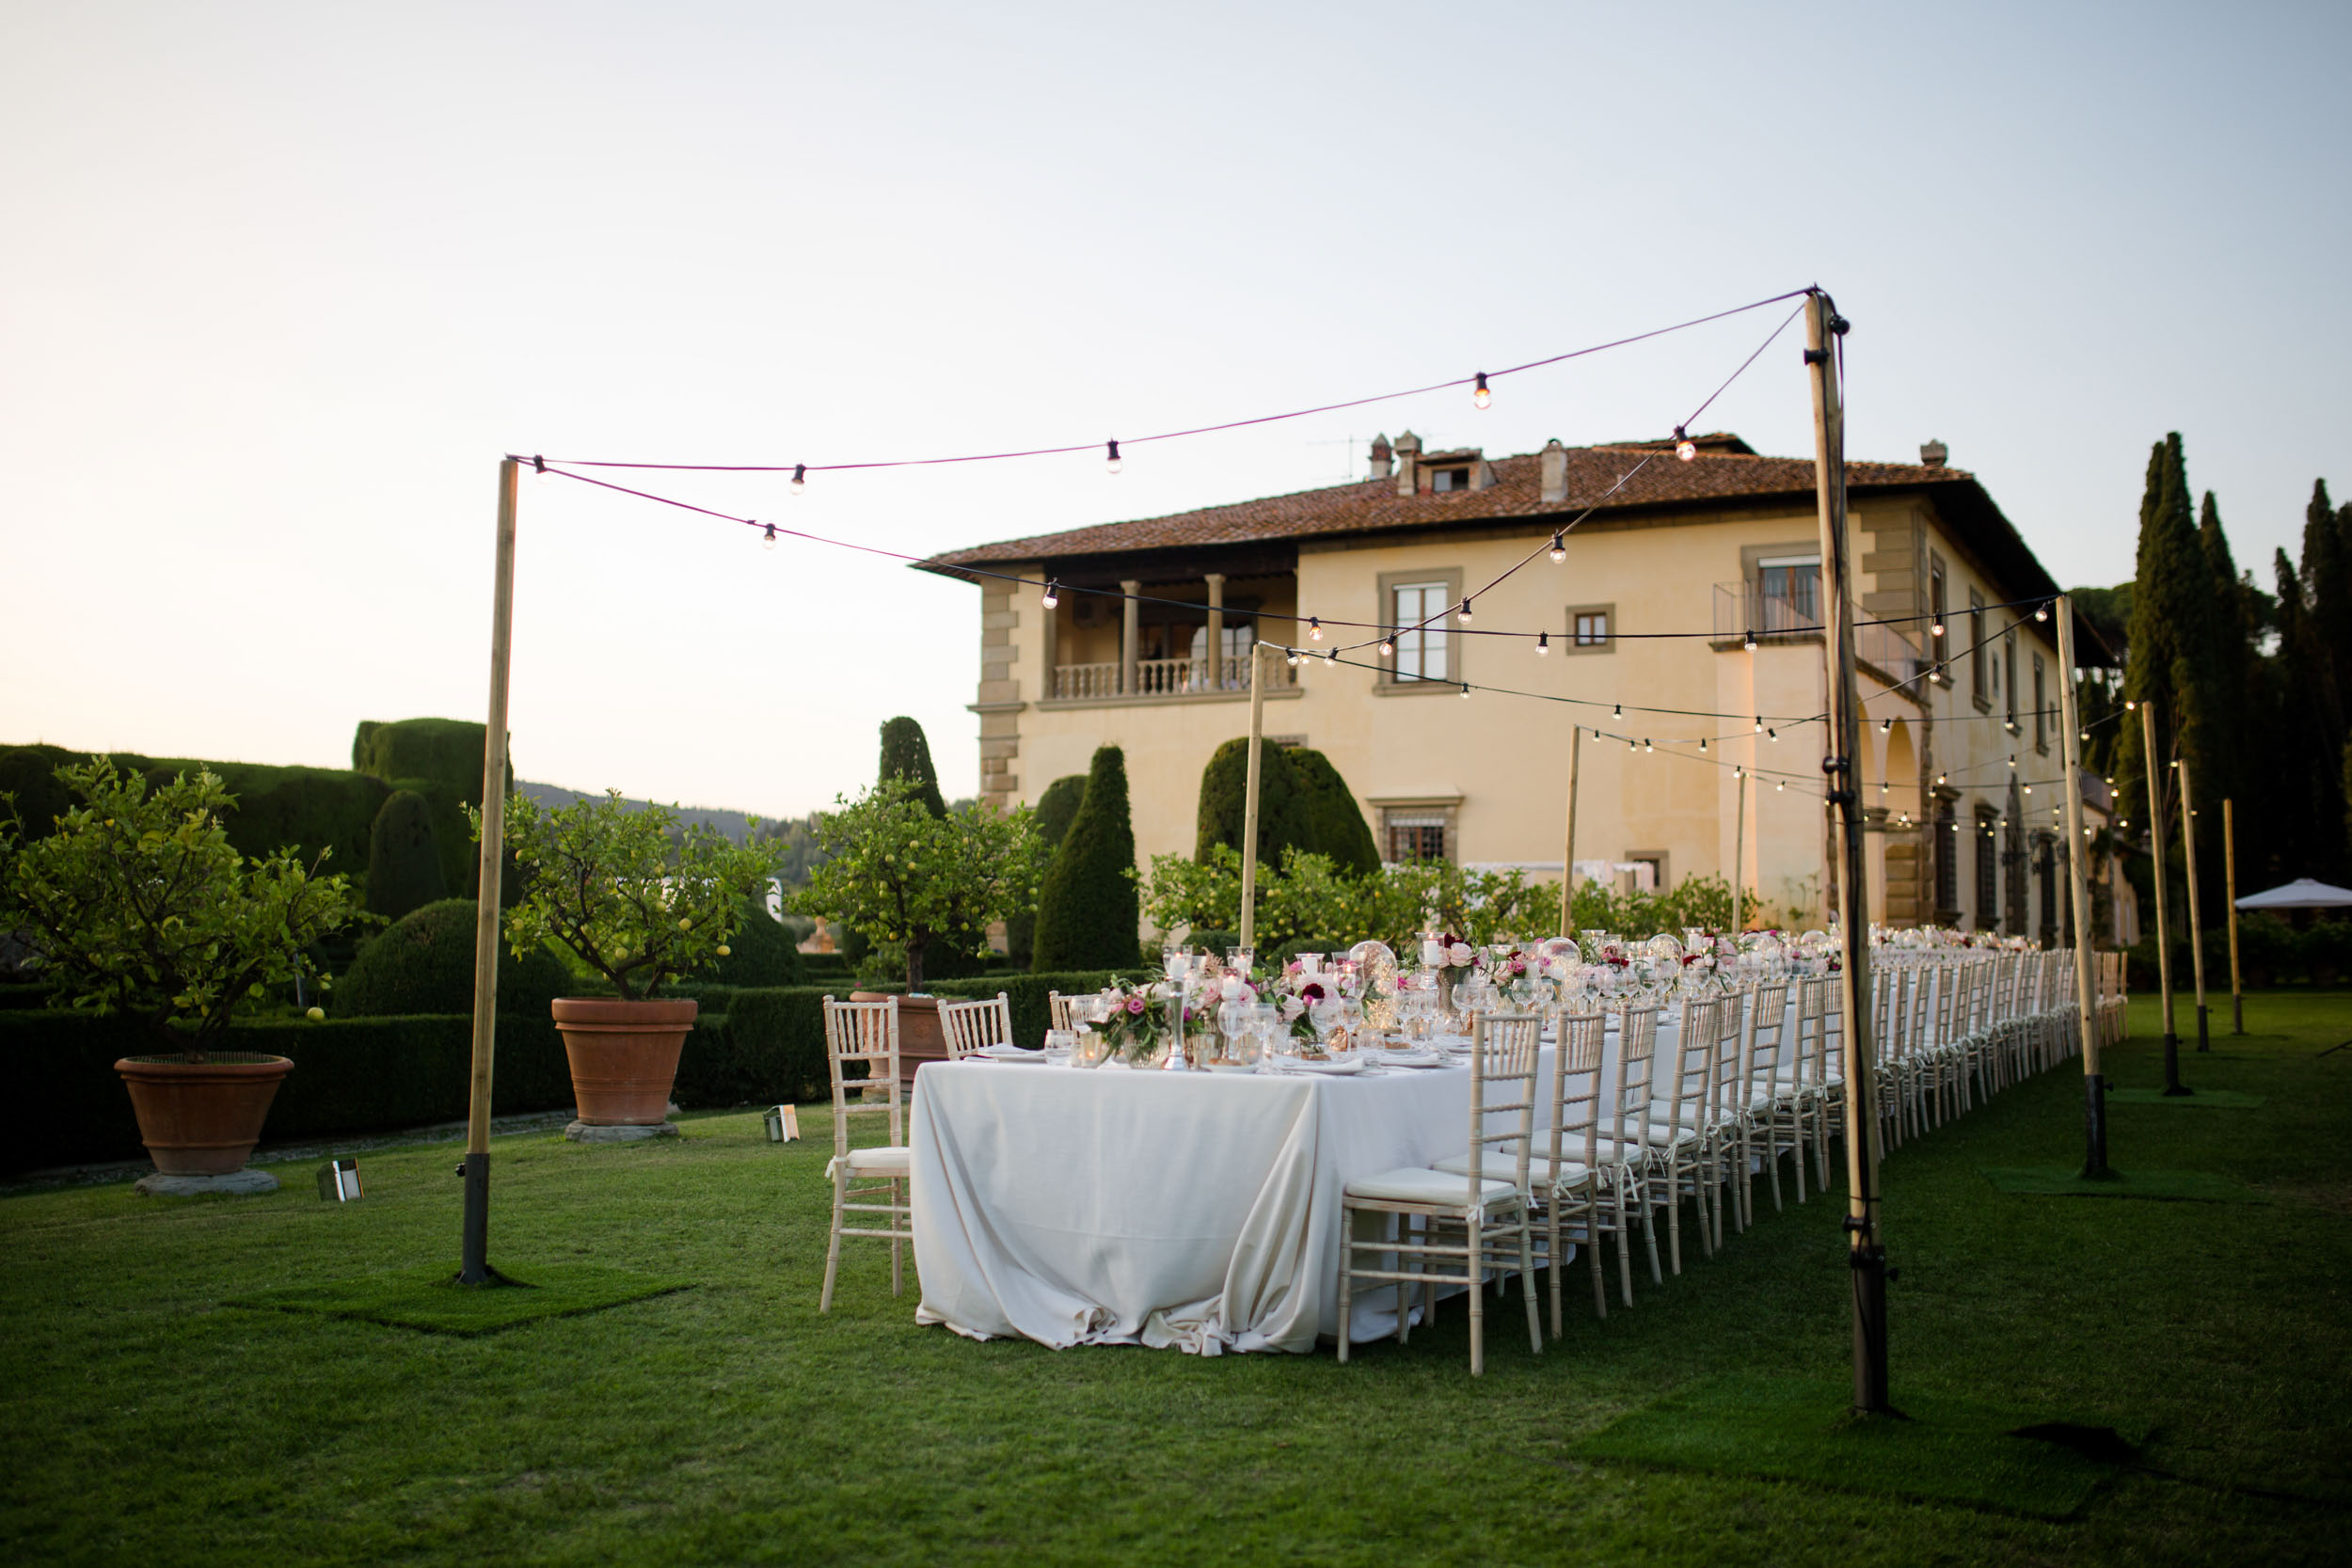 villa-gamberaia-florence-italy-destination-wedding-63.jpg